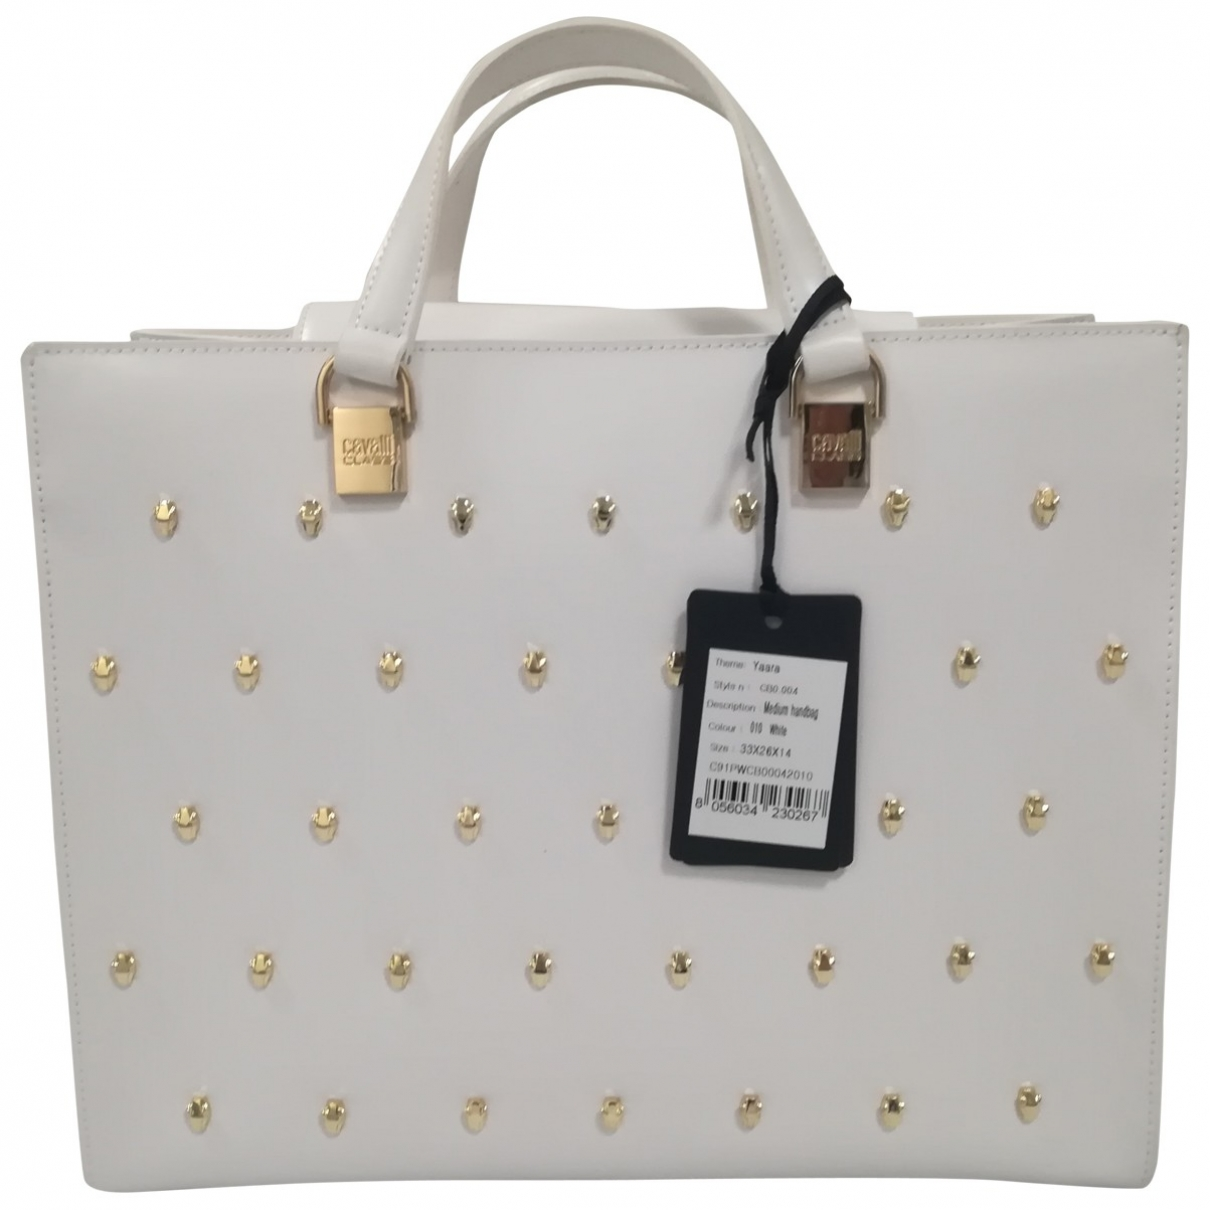 Class Cavalli \N White Leather handbag for Women \N